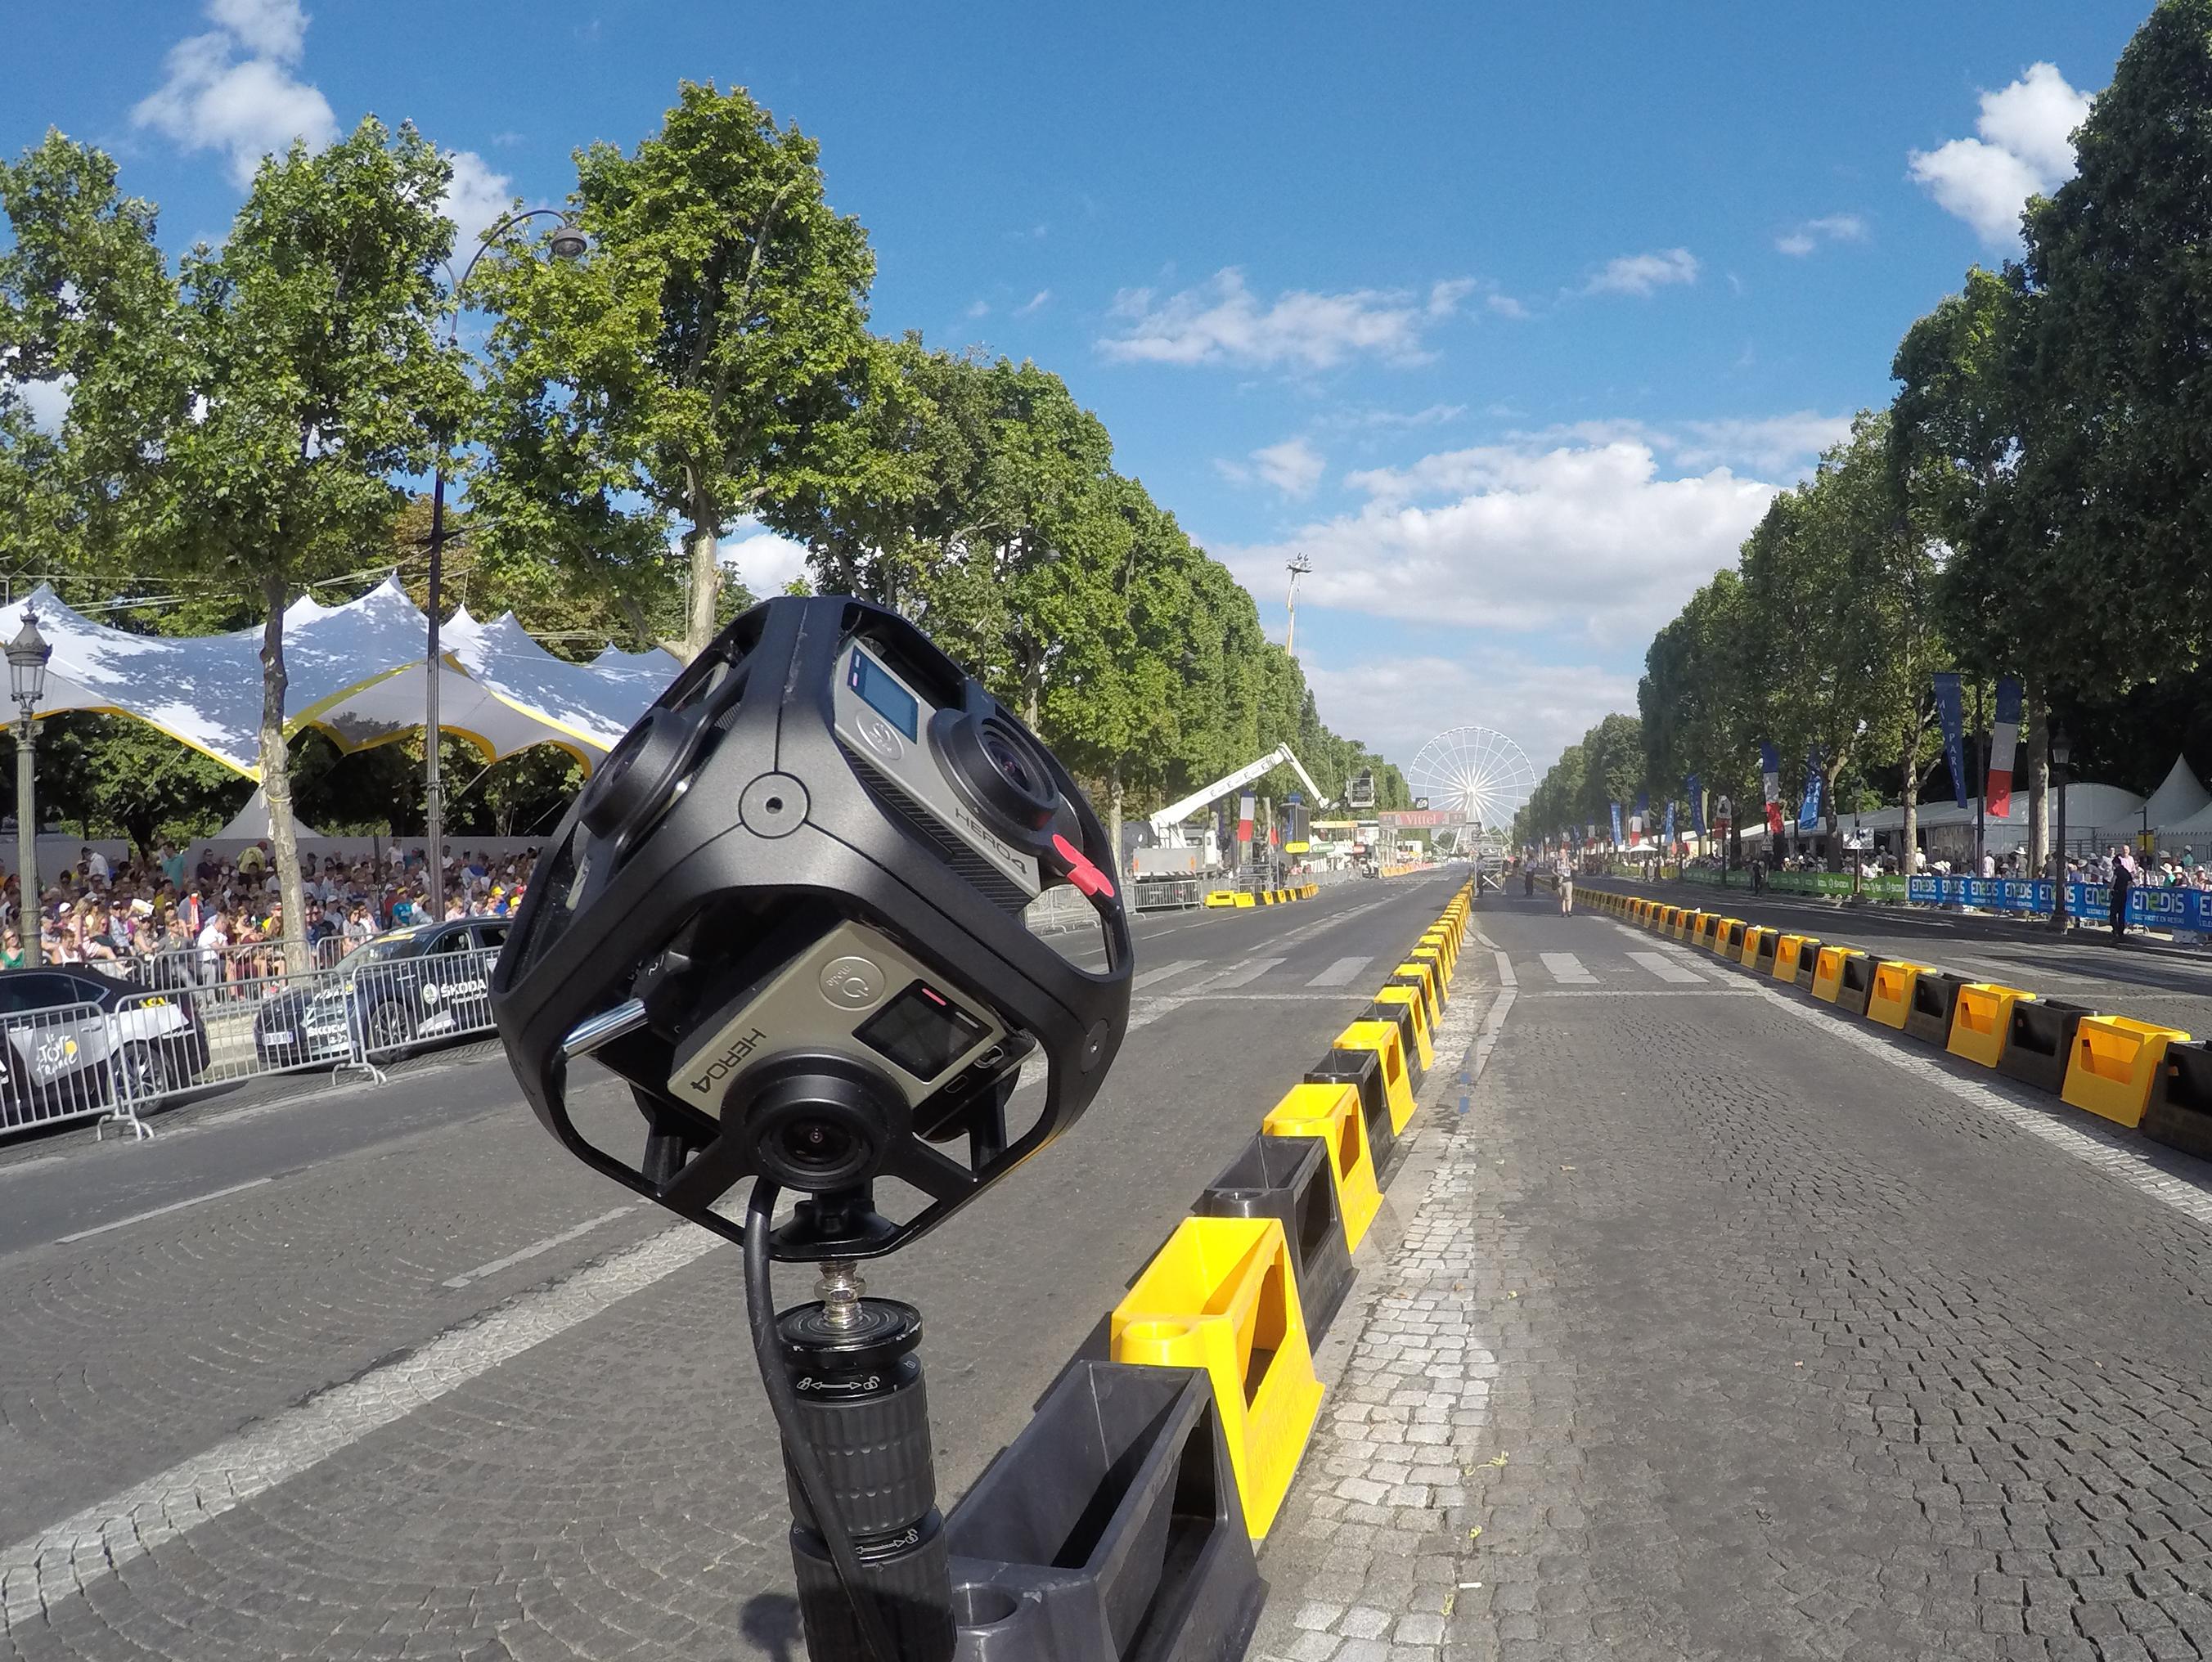 GoPro camera on a track.